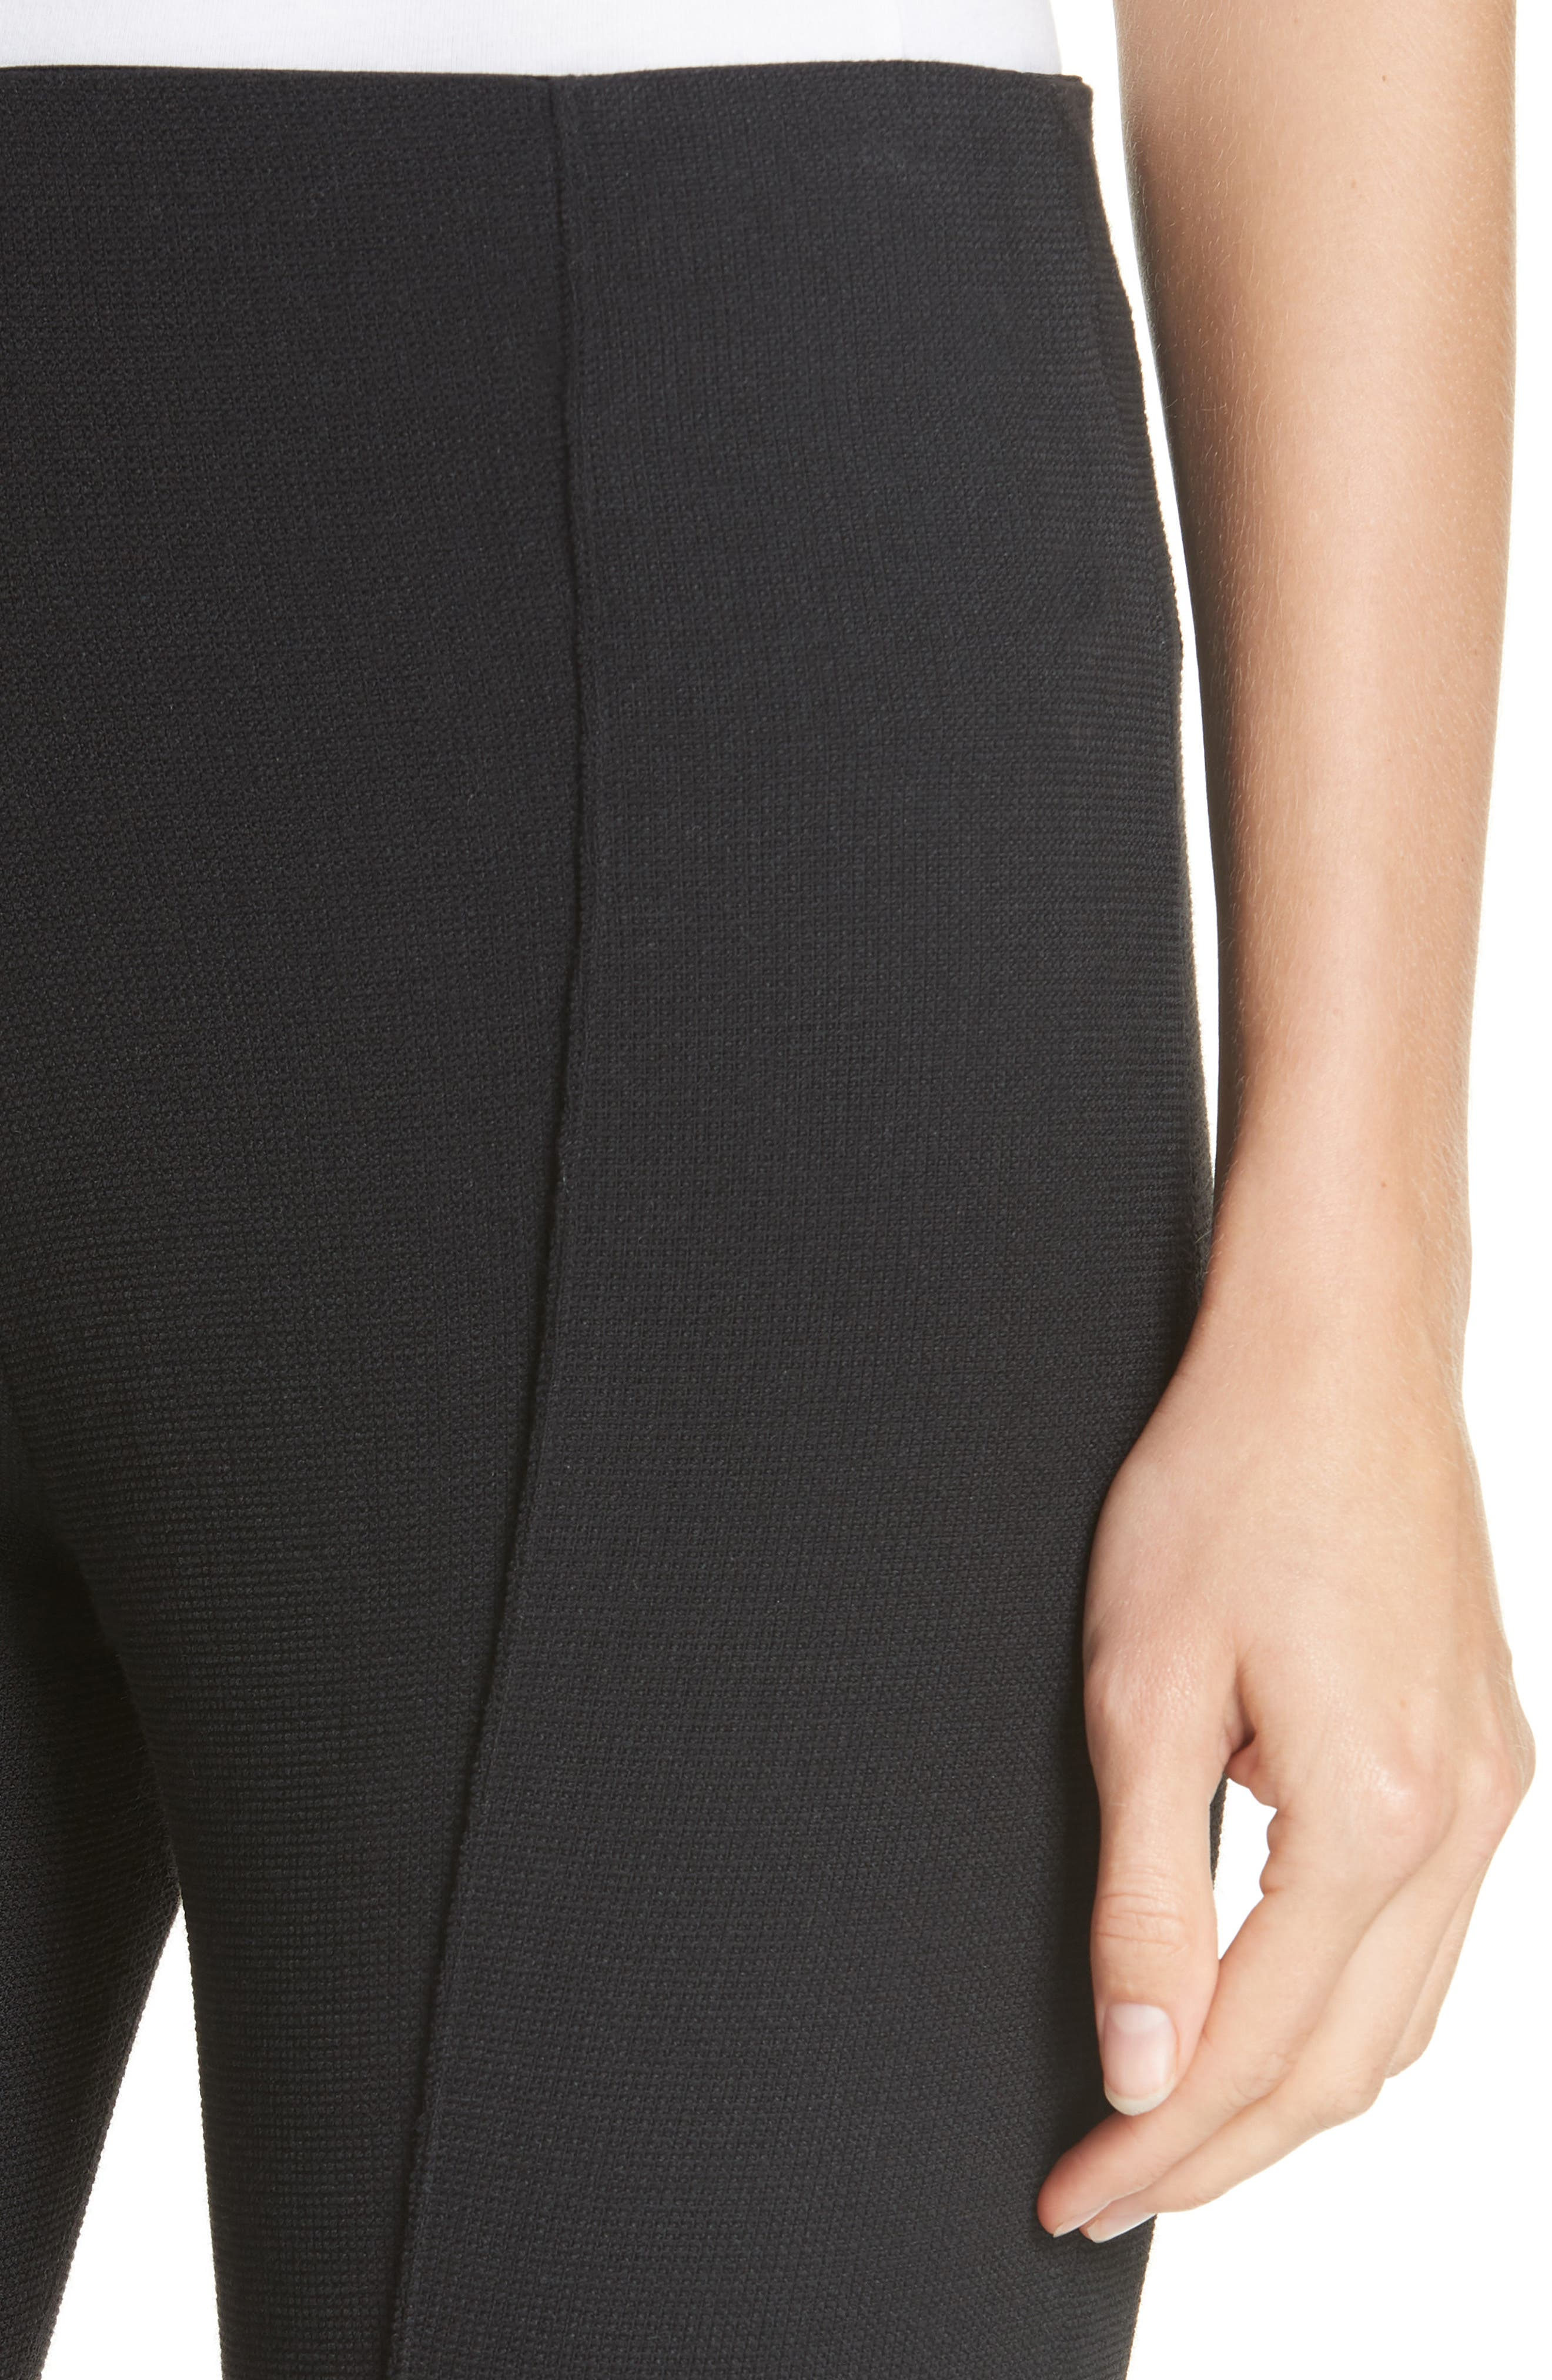 Pull-On Wool Blend Crop Flare Pants,                             Alternate thumbnail 4, color,                             BLACK PIQUE